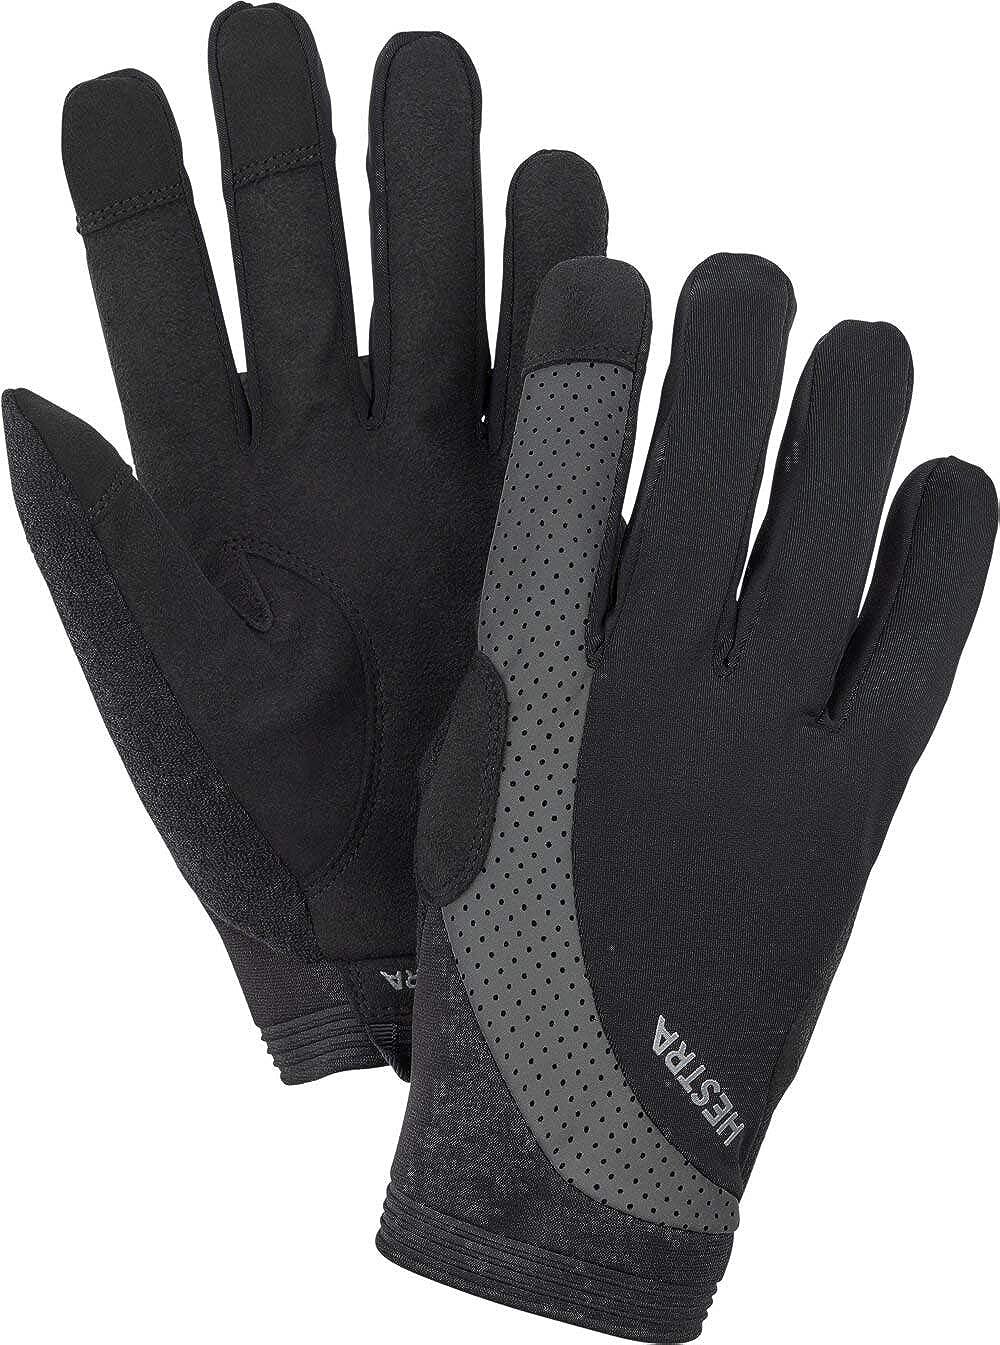 Hestra Apex Ranking TOP6 Reflective Long Bike 5-Finger - for Biki Baltimore Mall Glove